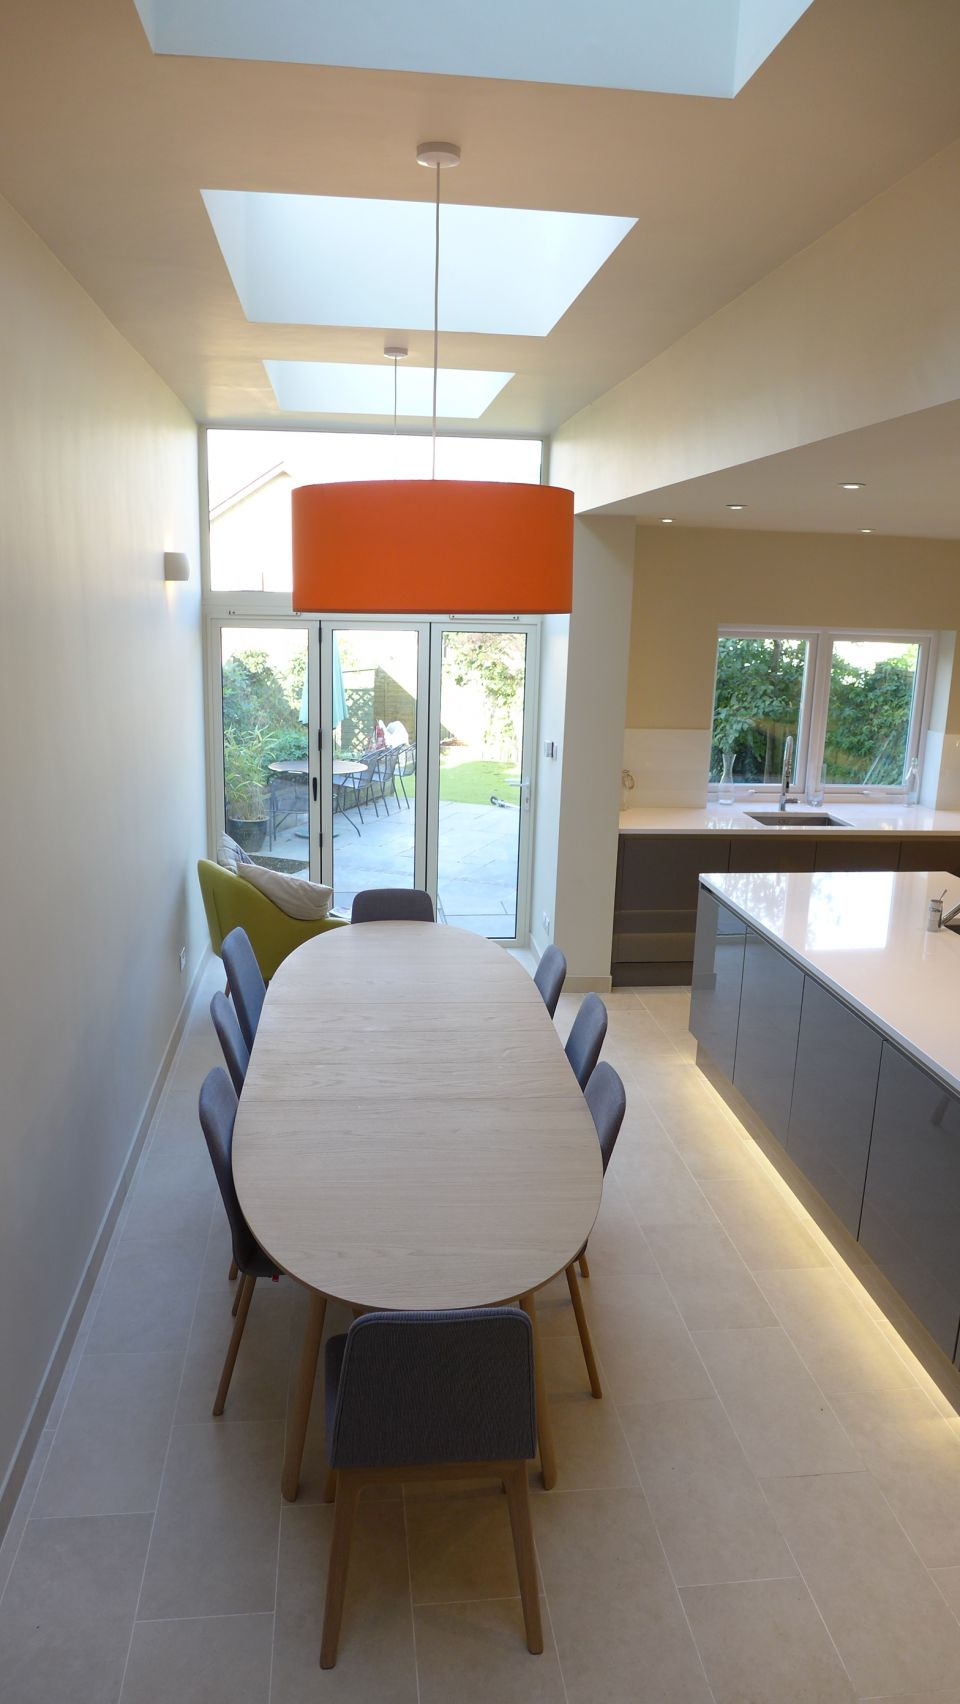 kitchen-diner-in-side-extension